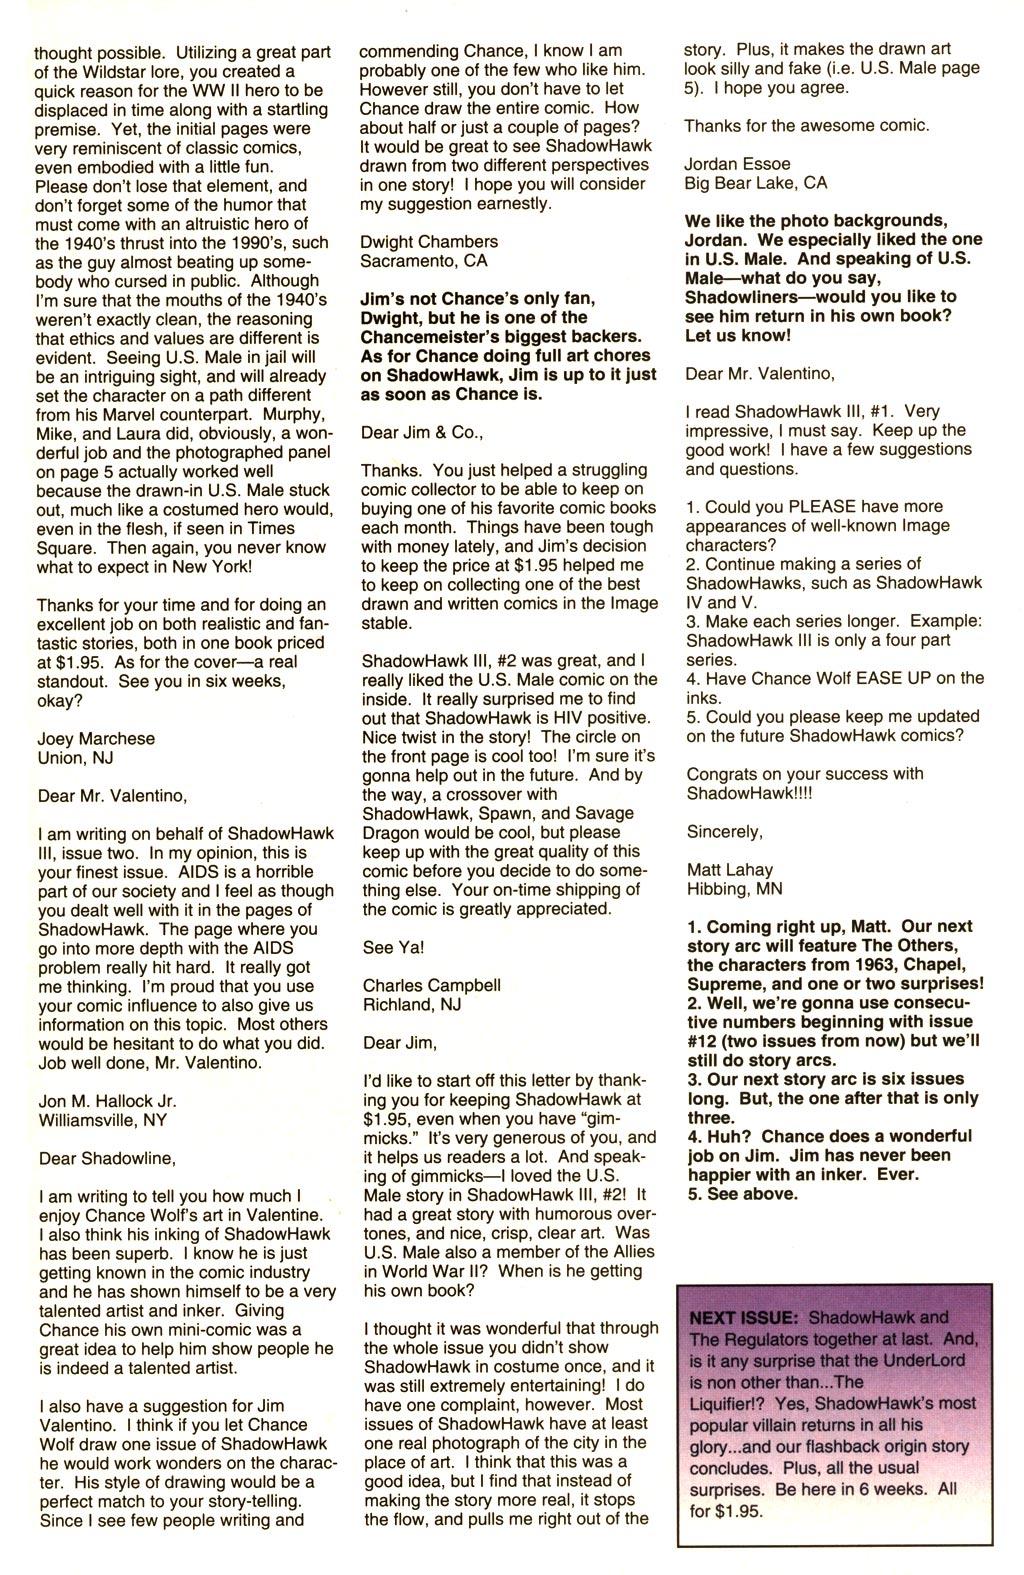 Read online ShadowHawk comic -  Issue #10 - 26